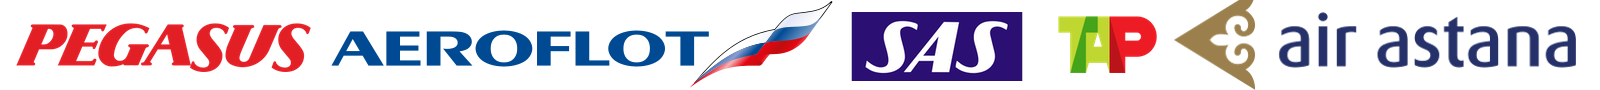 Авиакомпании Pegasus, Aeroflot, SAS, TAP Portugal, Air Astana